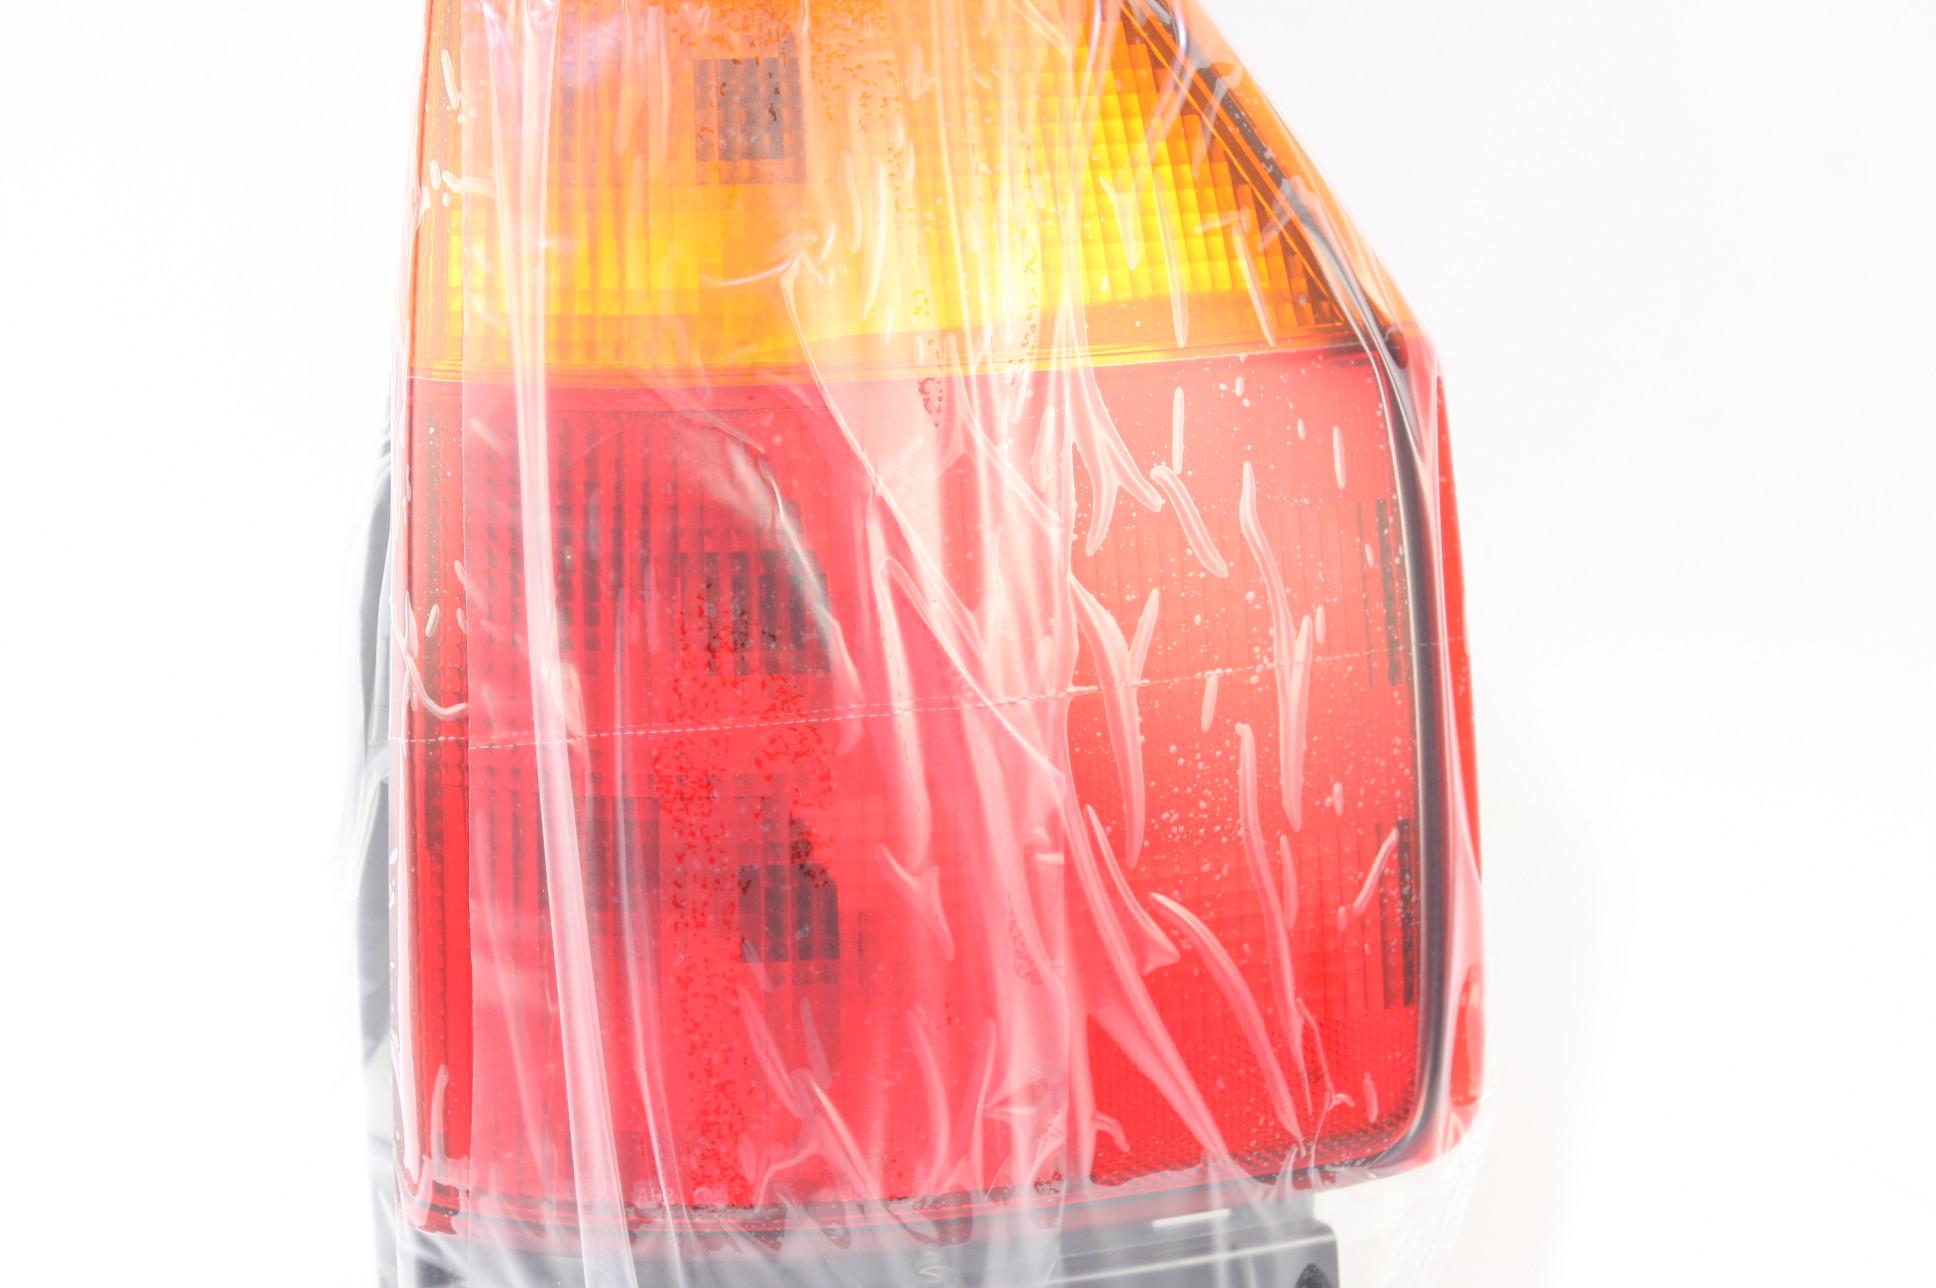 *New OEM GM 15131577 GMC Envoy 02-09 Right Rear Brake Taillight Taillamp Lens - image 3